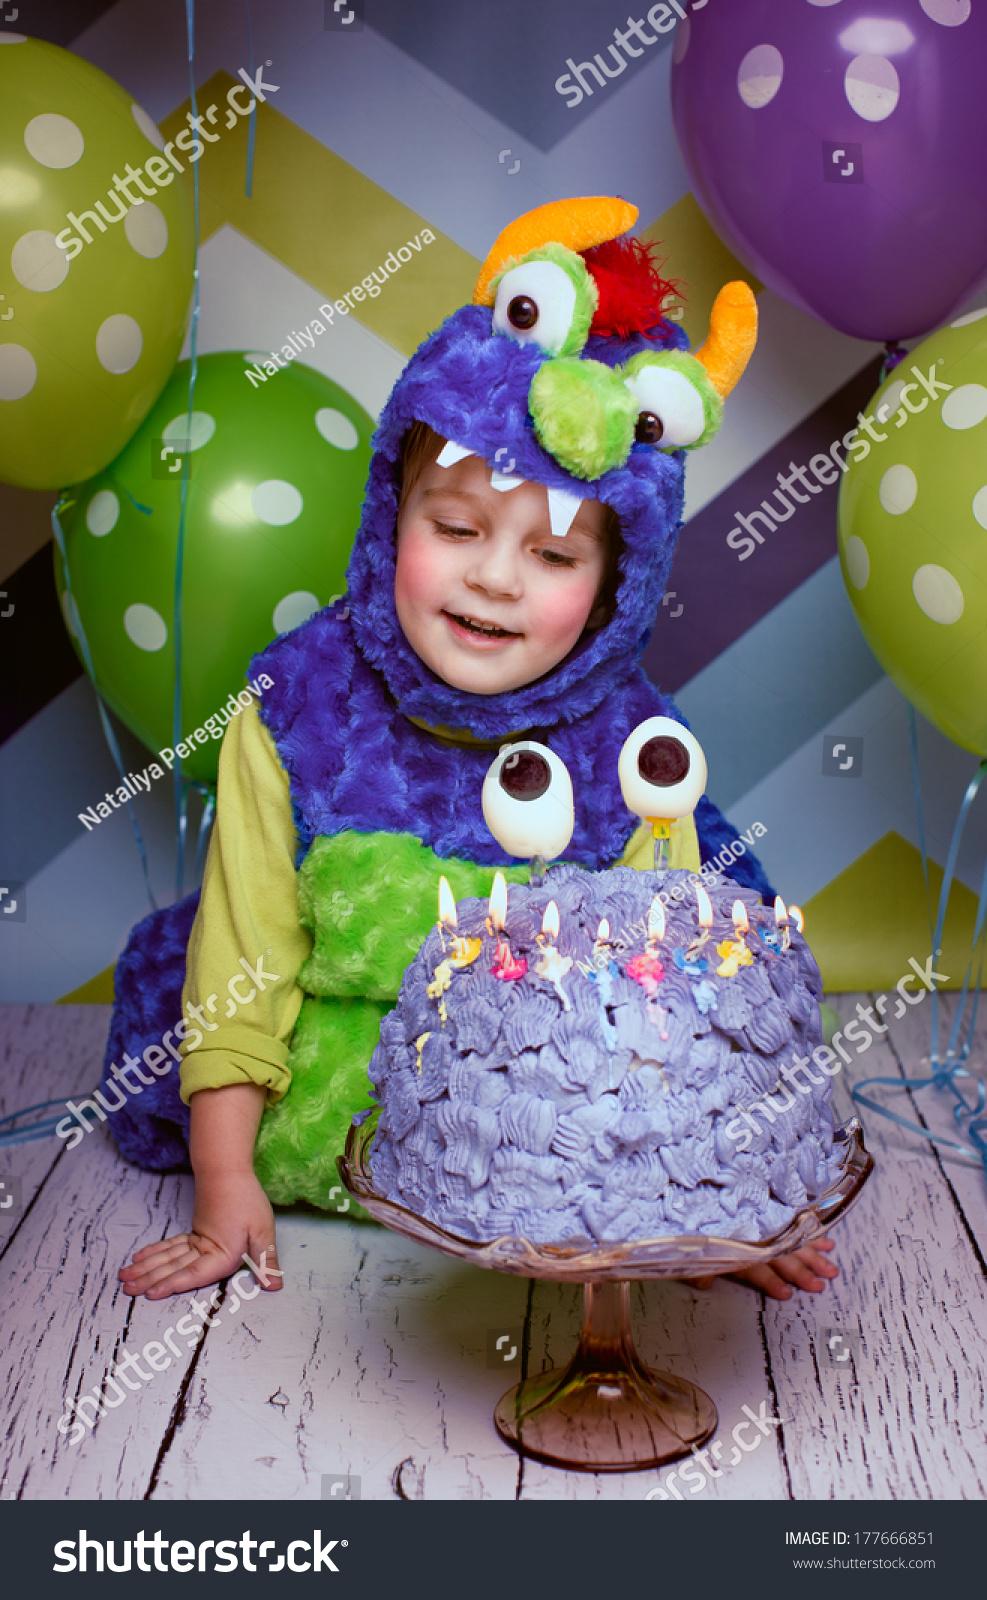 Fabulous Happy Birthday Funny Cake Boy Stock Photo Edit Now 177666851 Funny Birthday Cards Online Inifodamsfinfo